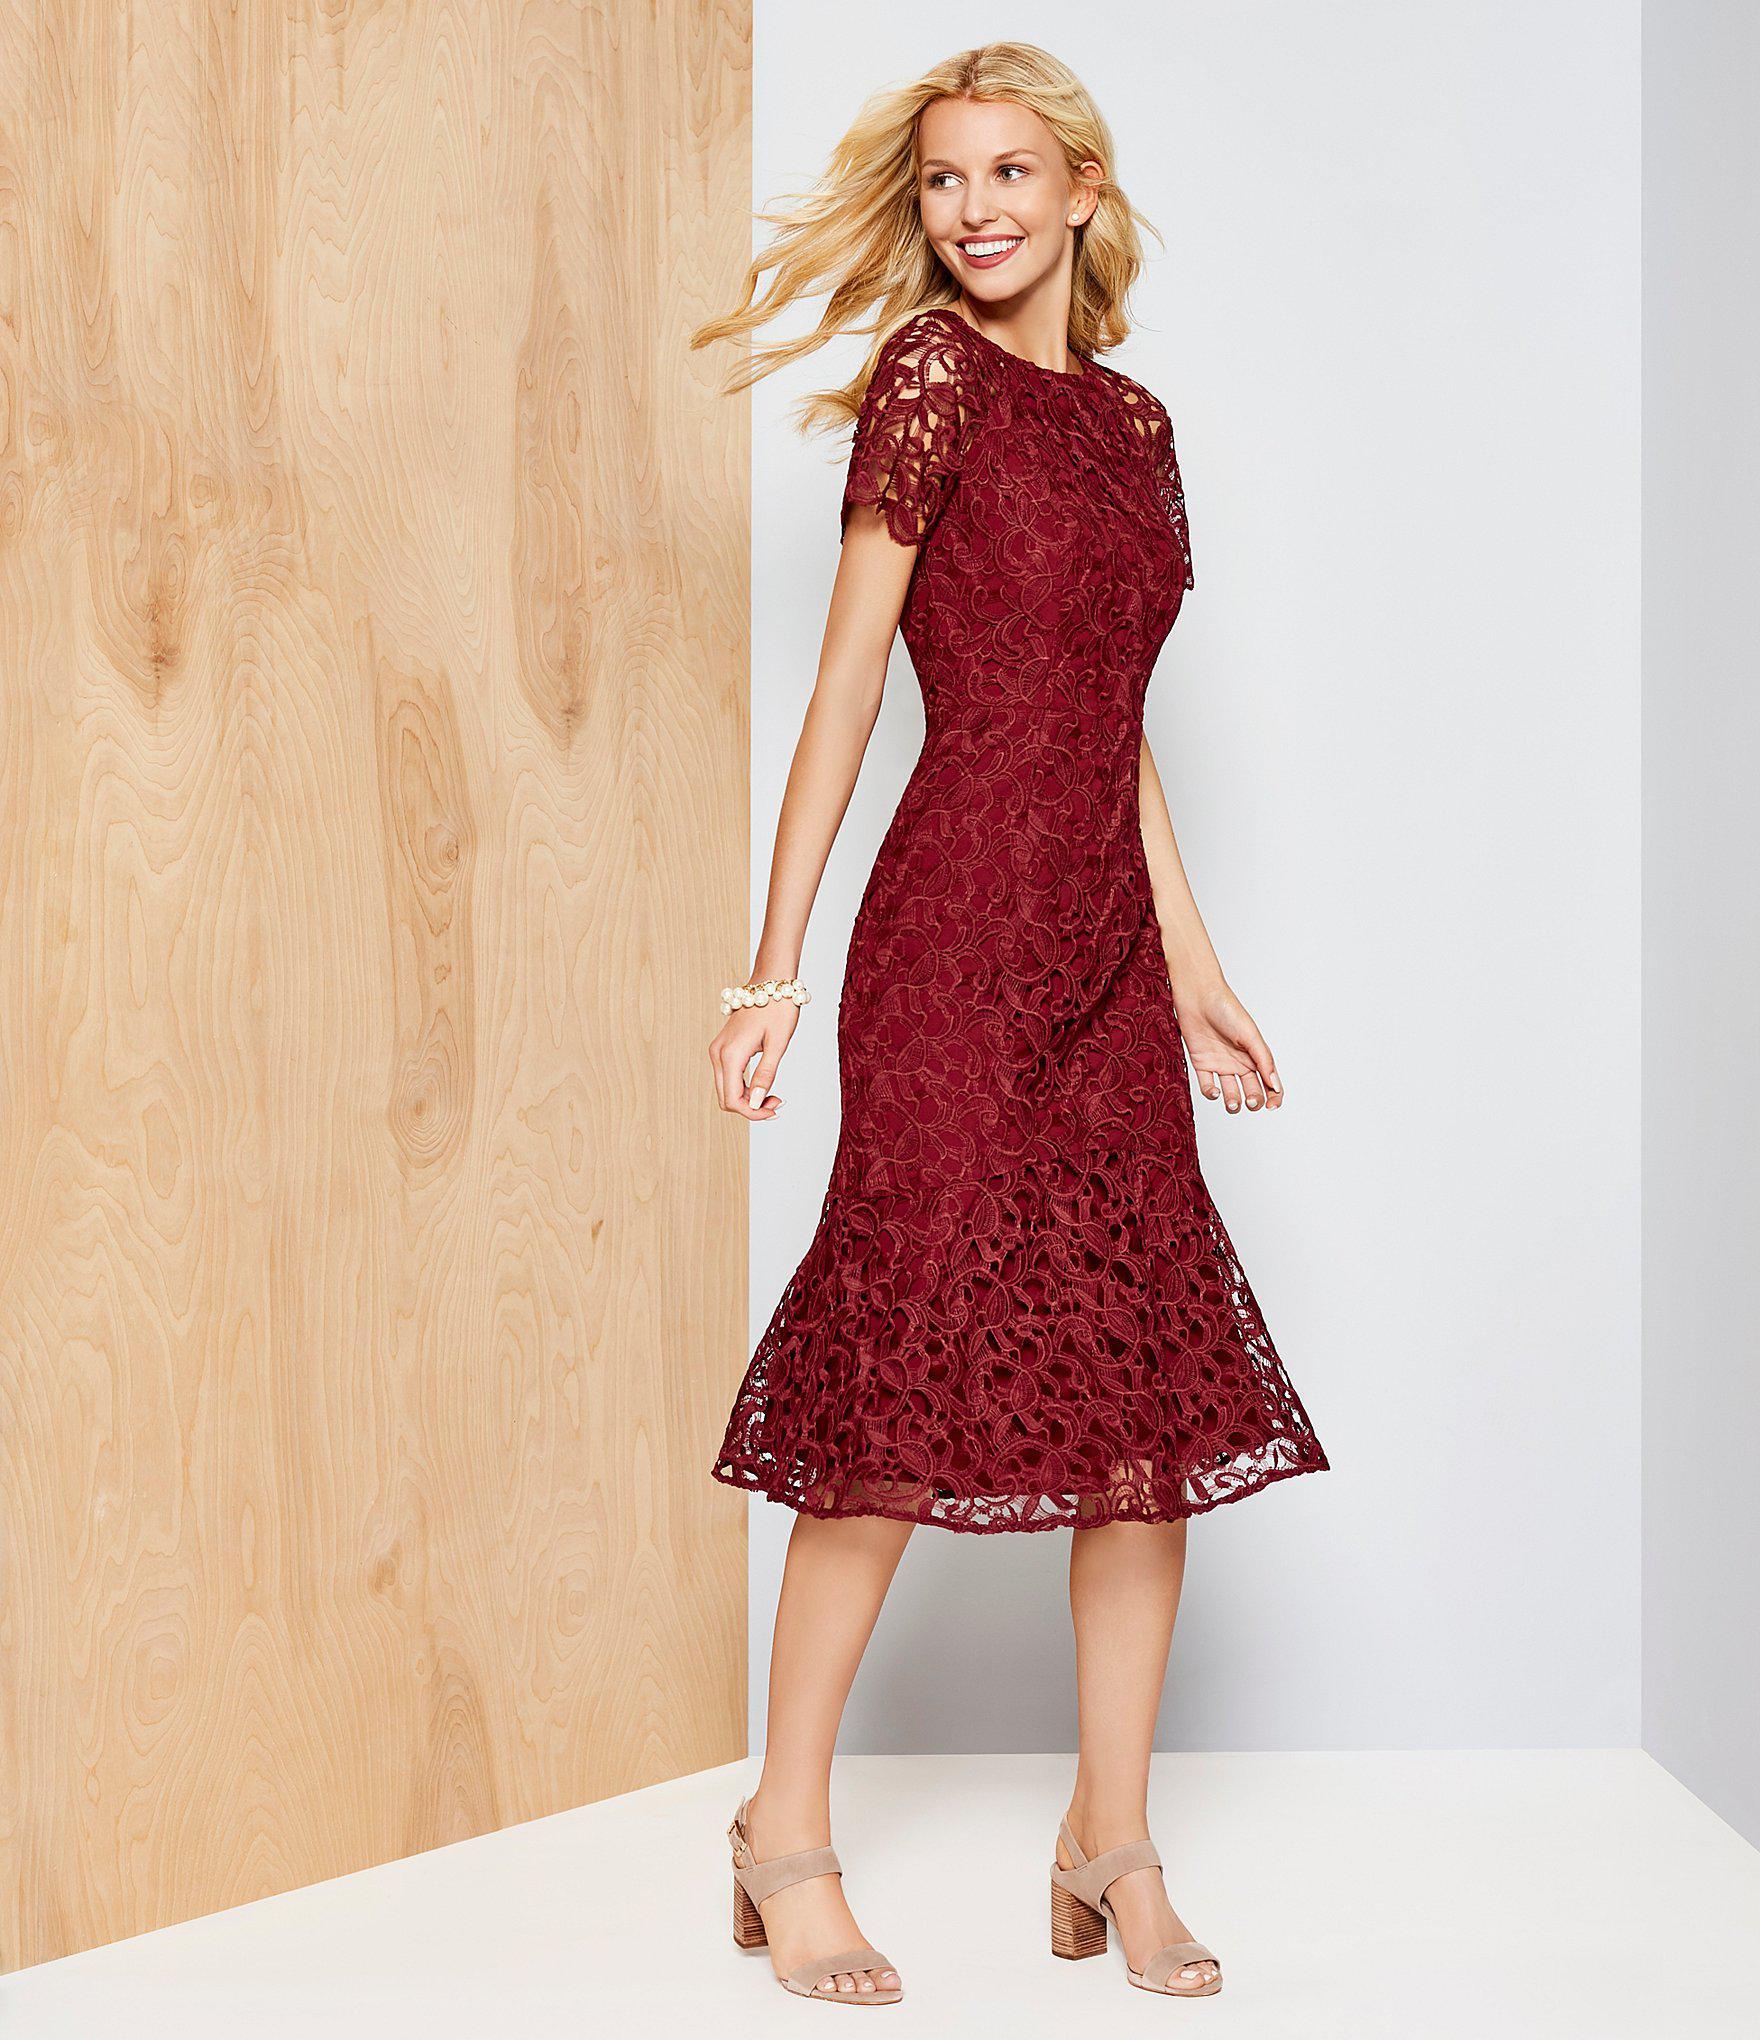 0ac3540faa3 Antonio Melani Penny Lace Midi Dress in Red - Lyst